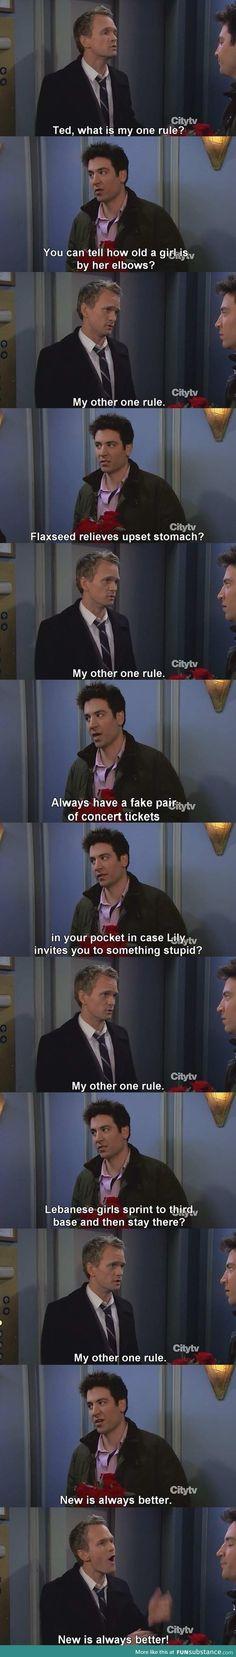 Barney has 1 rule #funny #humor #jokes #adult